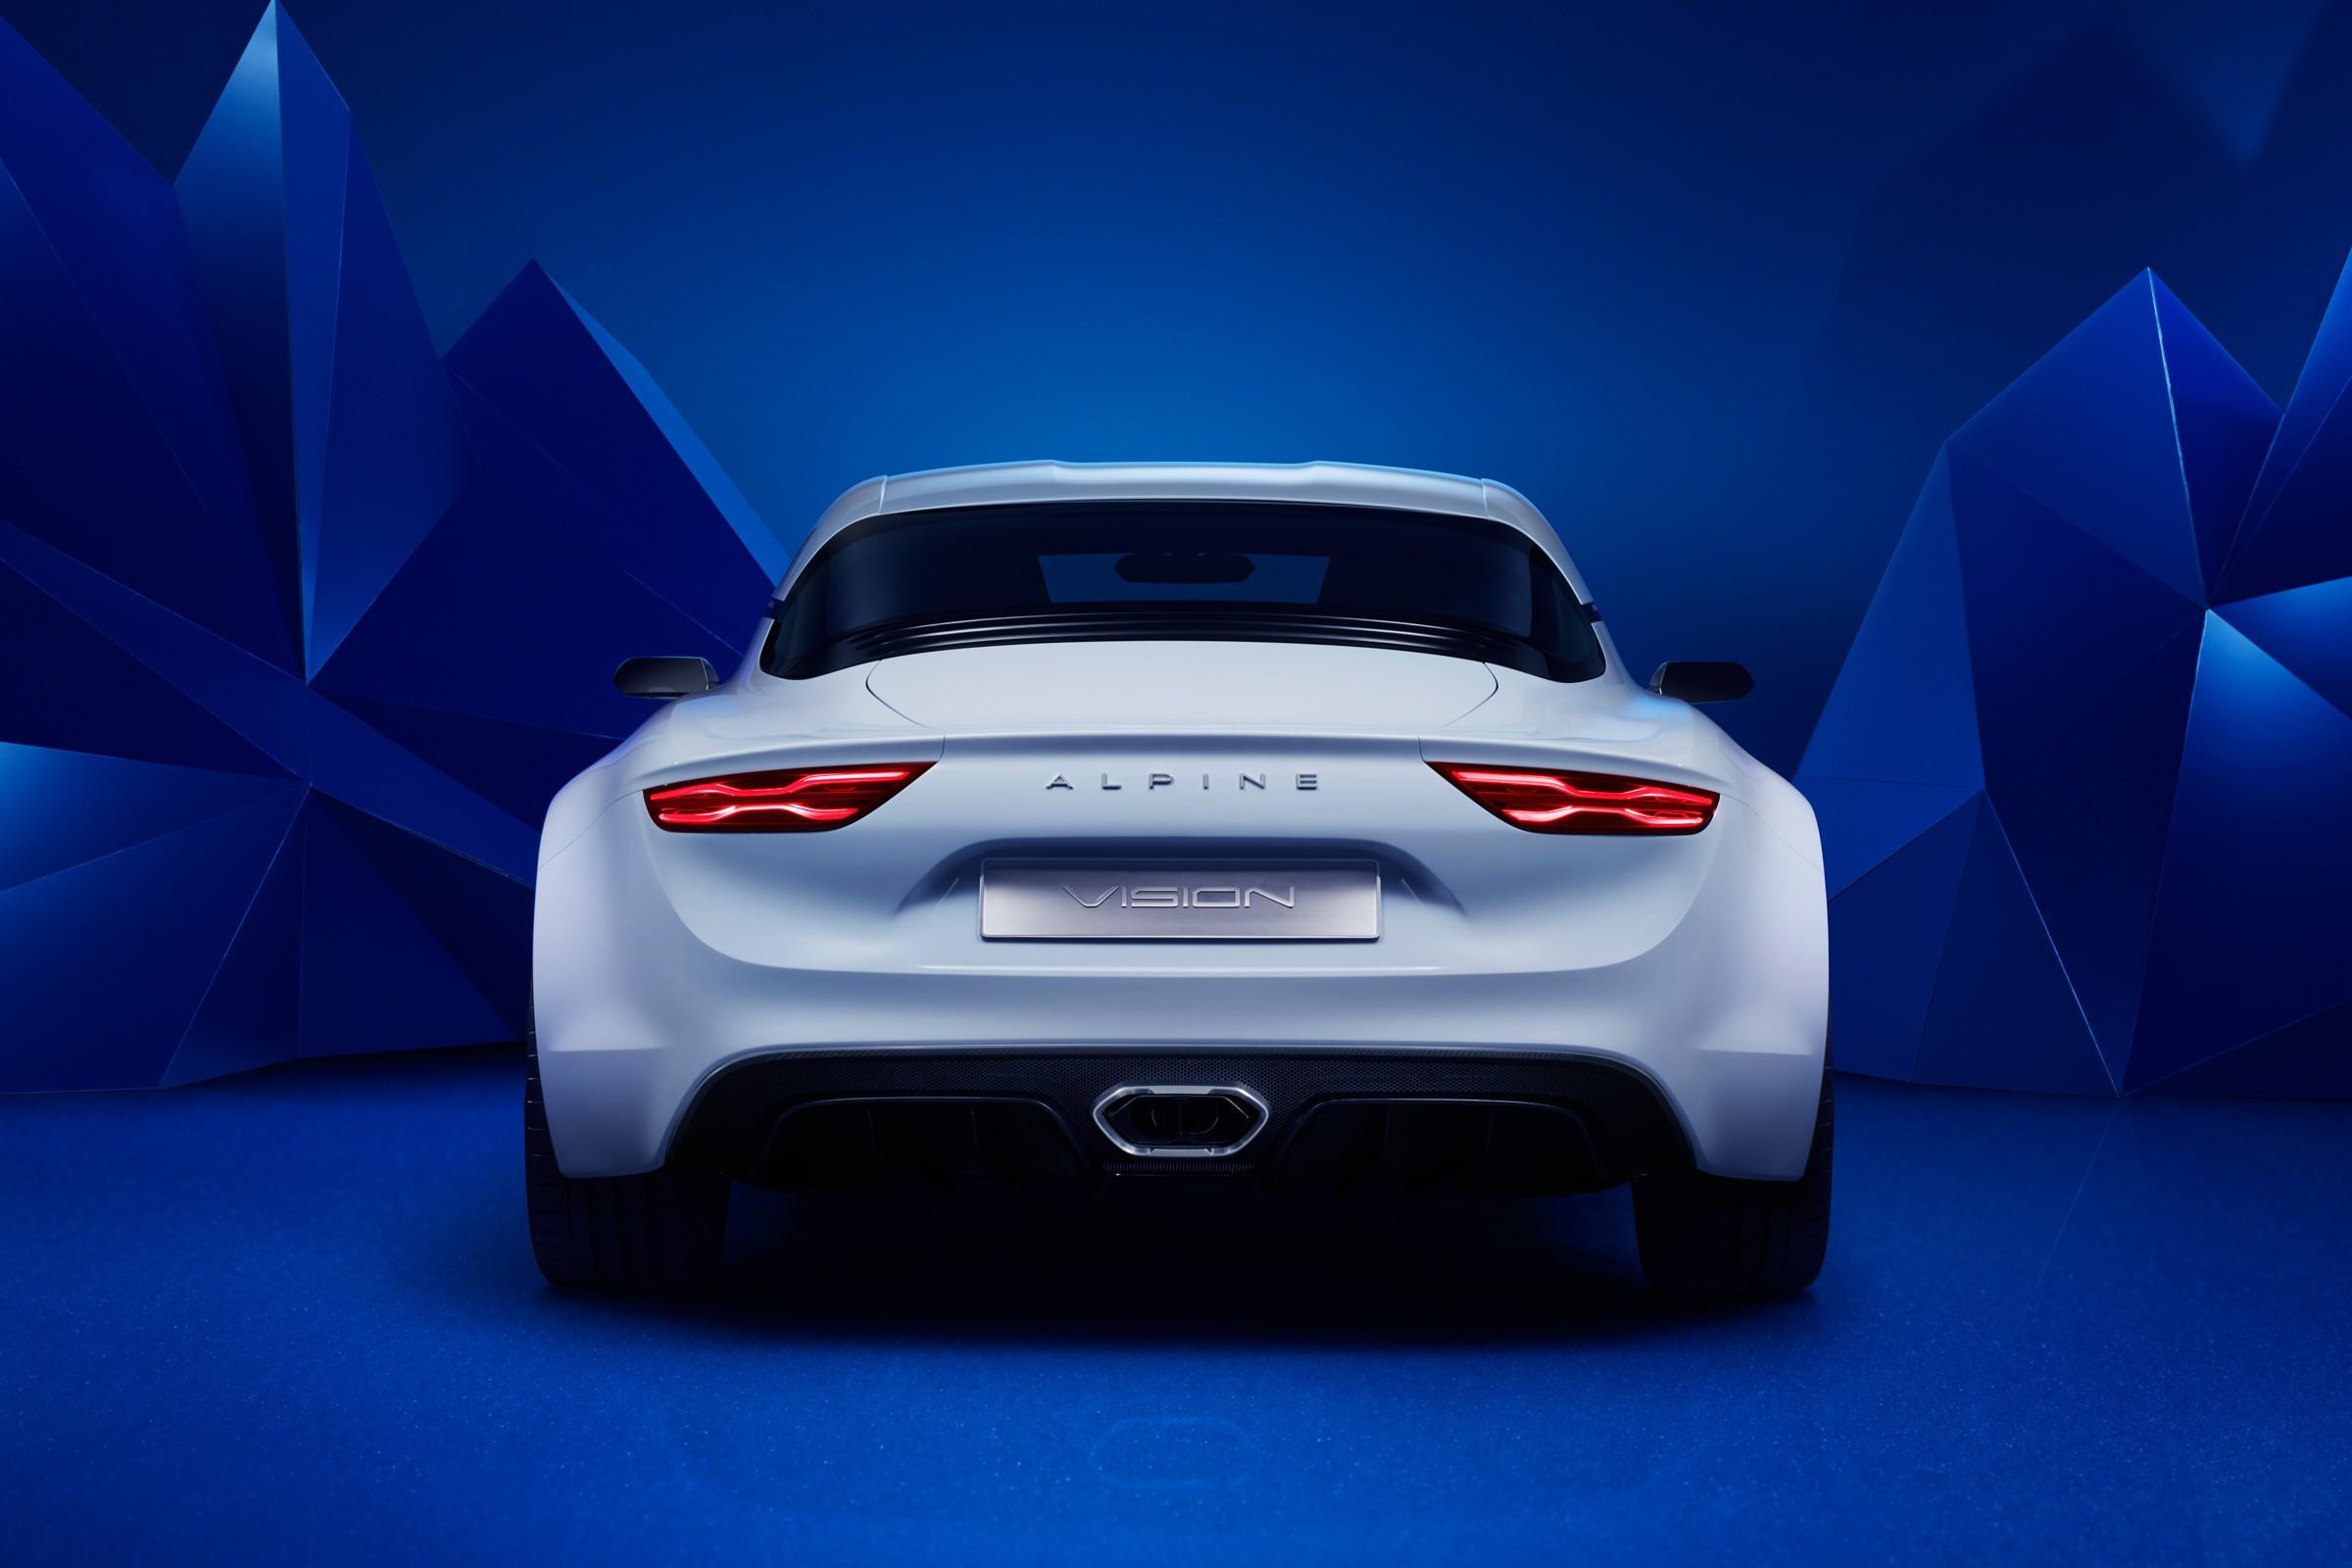 Alpine Brand Still Considers Developing An SUV Based Renault